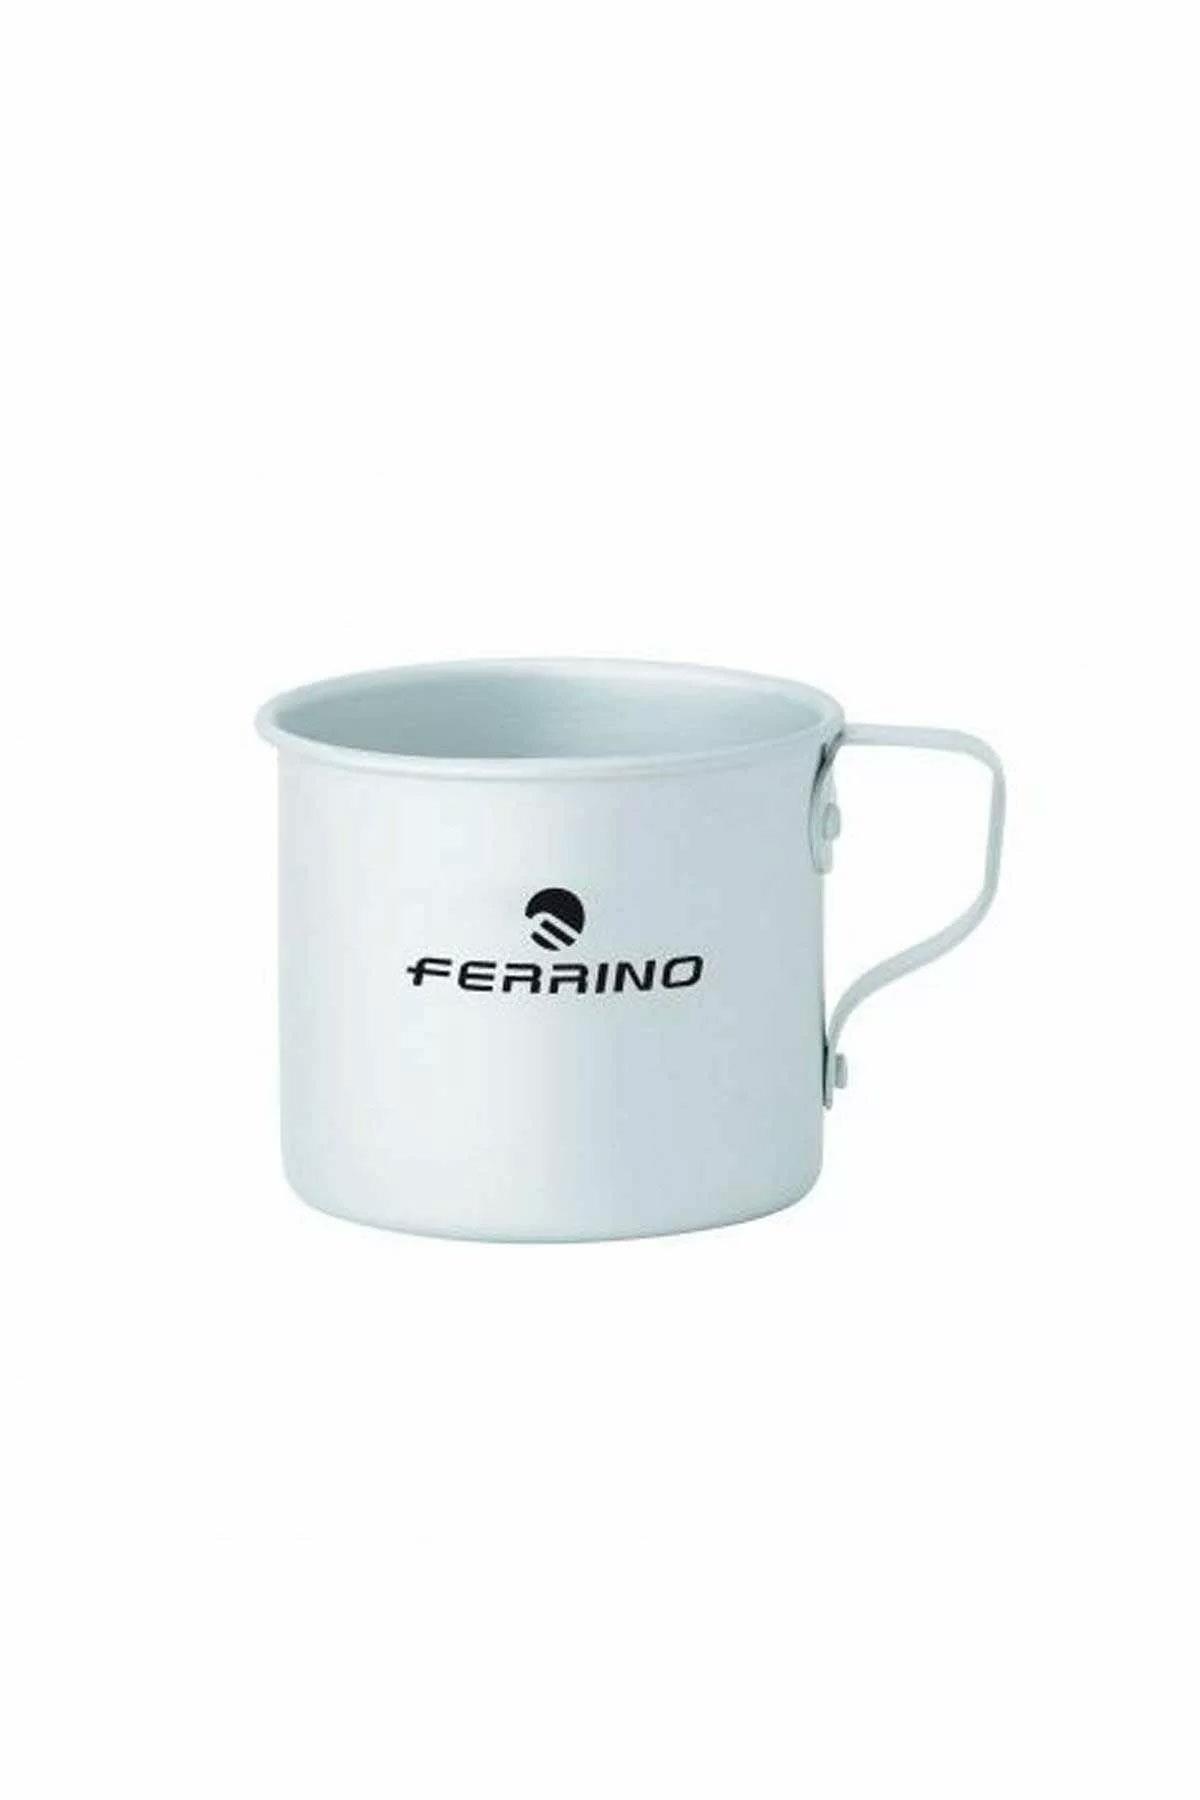 Ferrino Aliminyum Bardak Fer79299